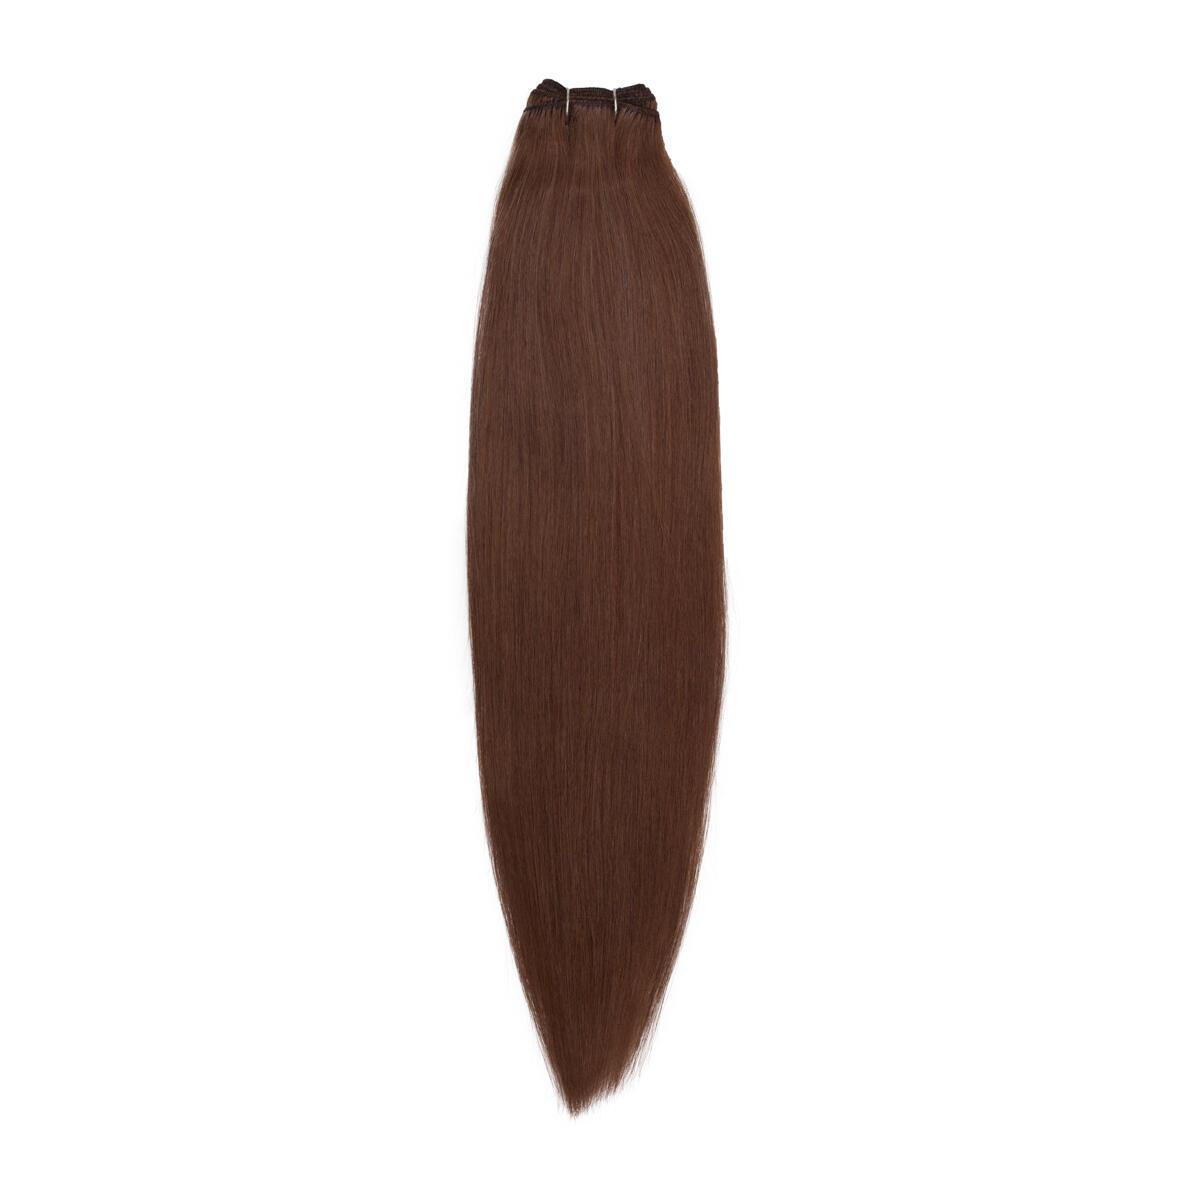 Hair Weft 5.0 Brown 50 cm